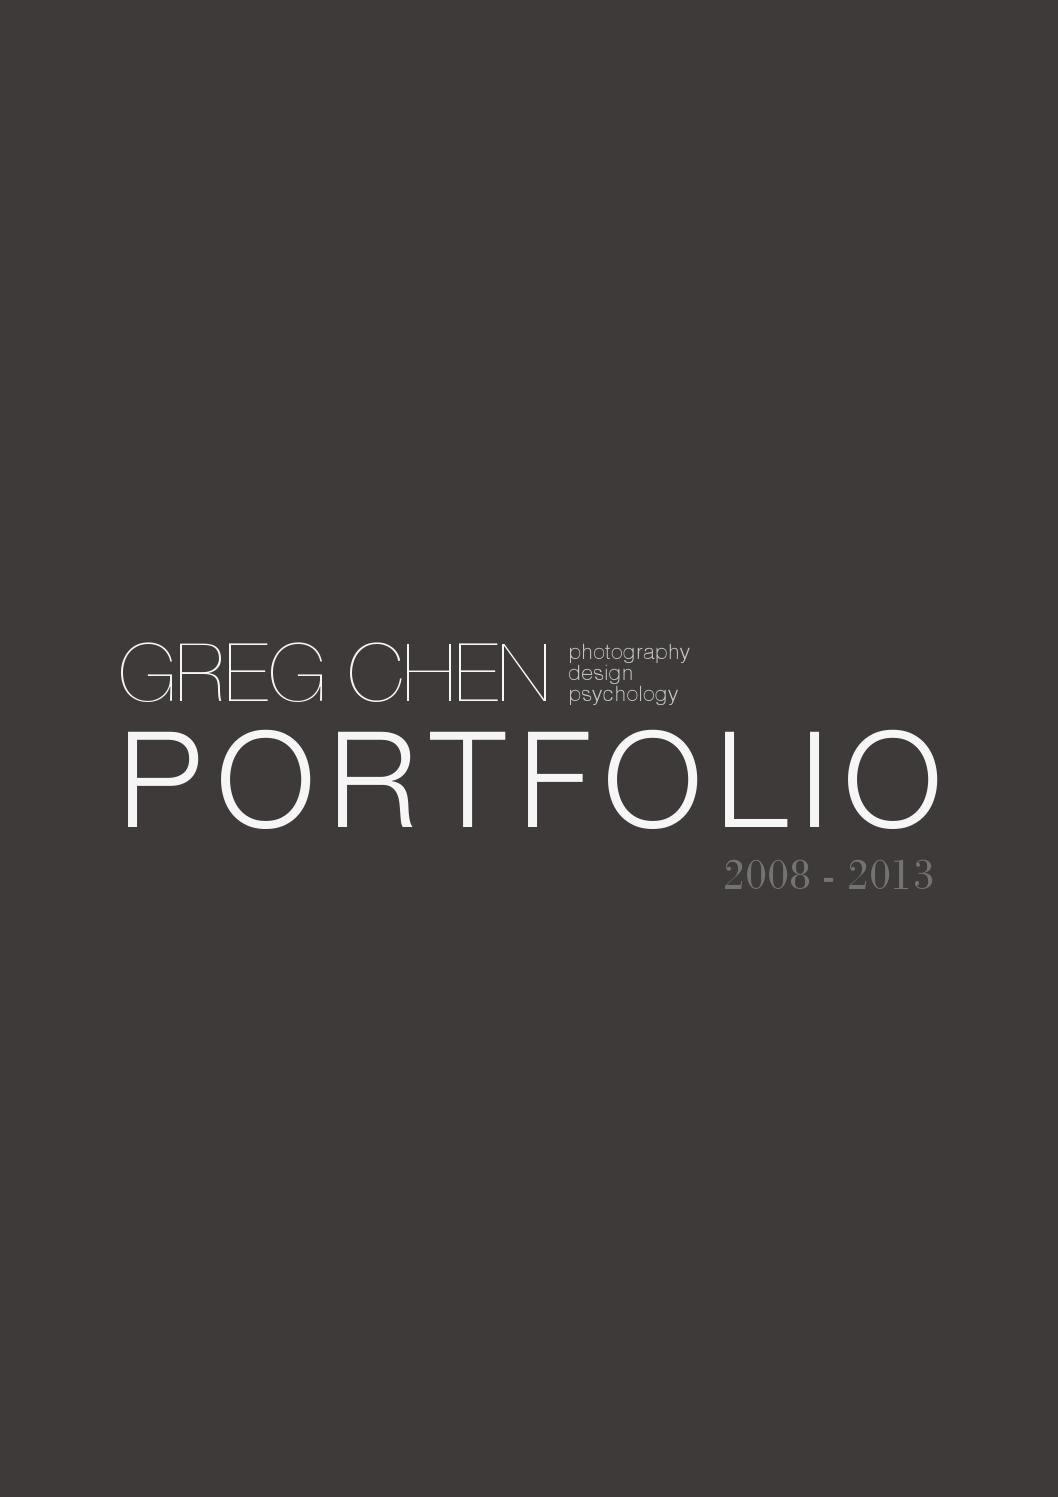 Cover Page for Portfolio Template Inspirational Greg Chen Design Portfolio 2013 by Greg Chen issuu